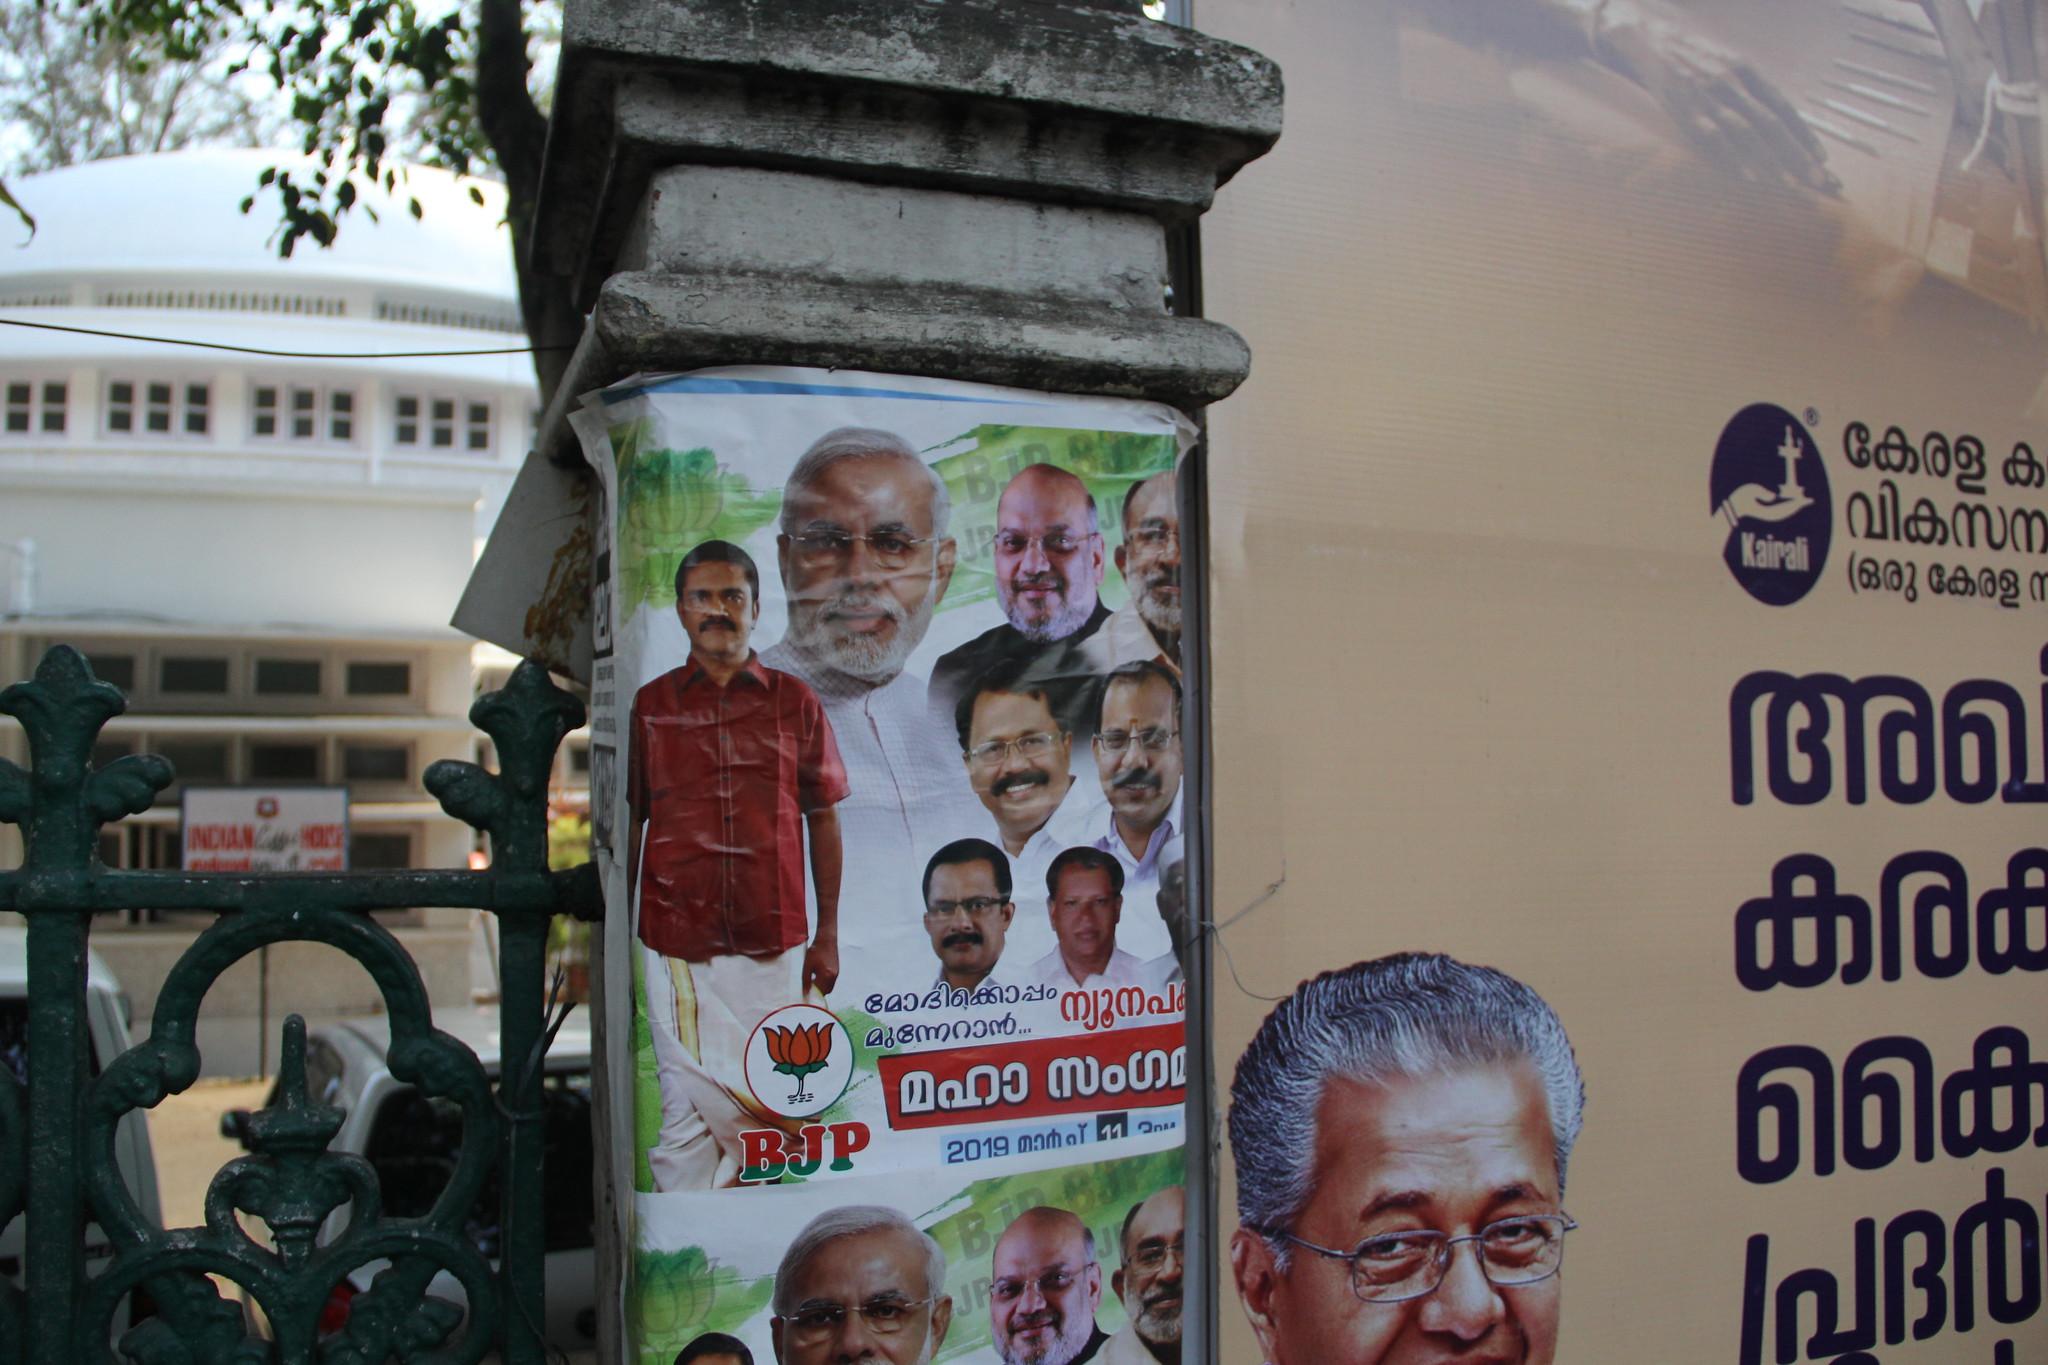 A BJP political poster in Thiruvananthapuram. (Photo by: Diana Kruzman)